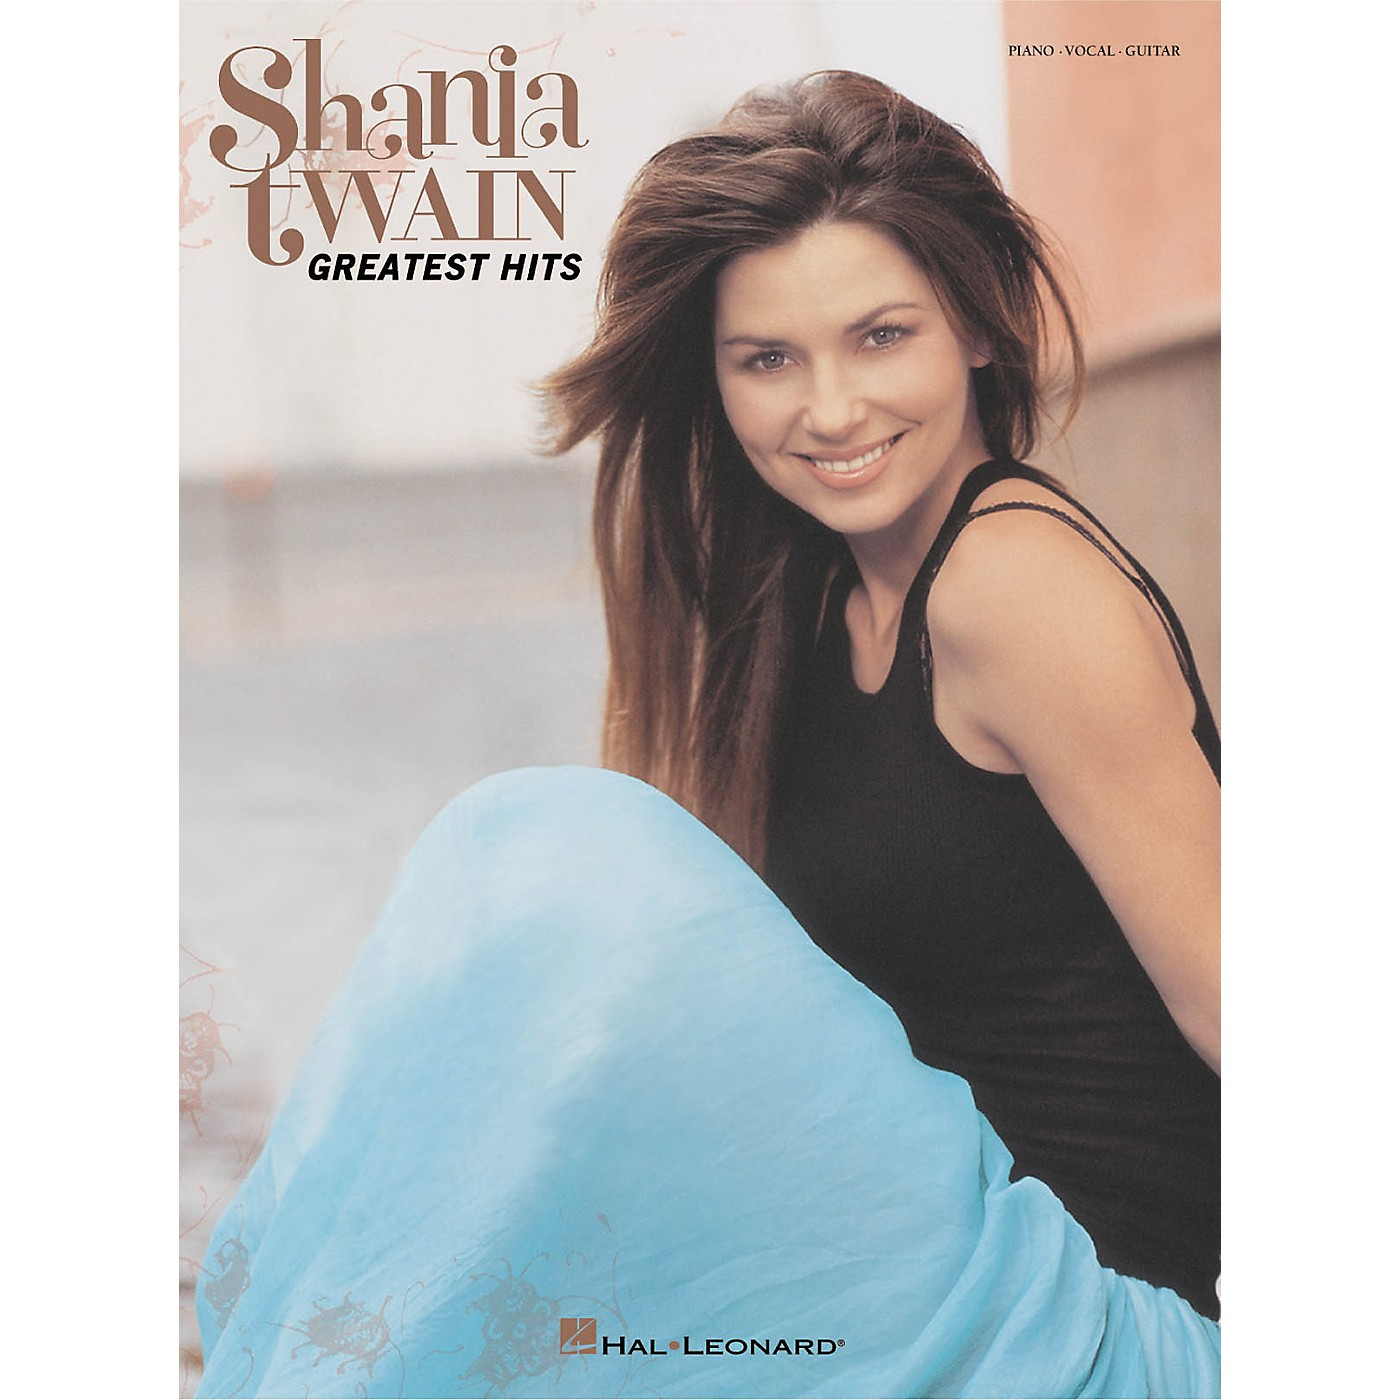 Hal Leonard Shania Twain - Greatest Hits Piano/Vocal/Guitar Songbook thumbnail